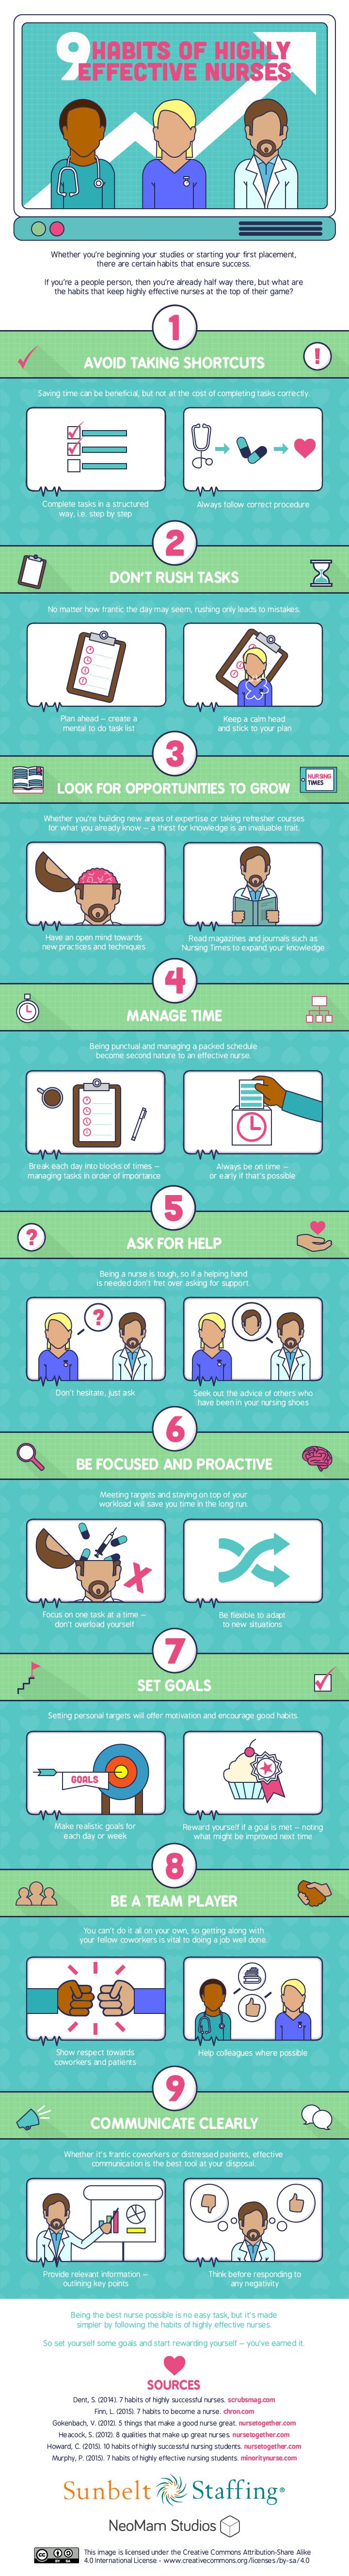 9 Habits of Highly Effective Nurses